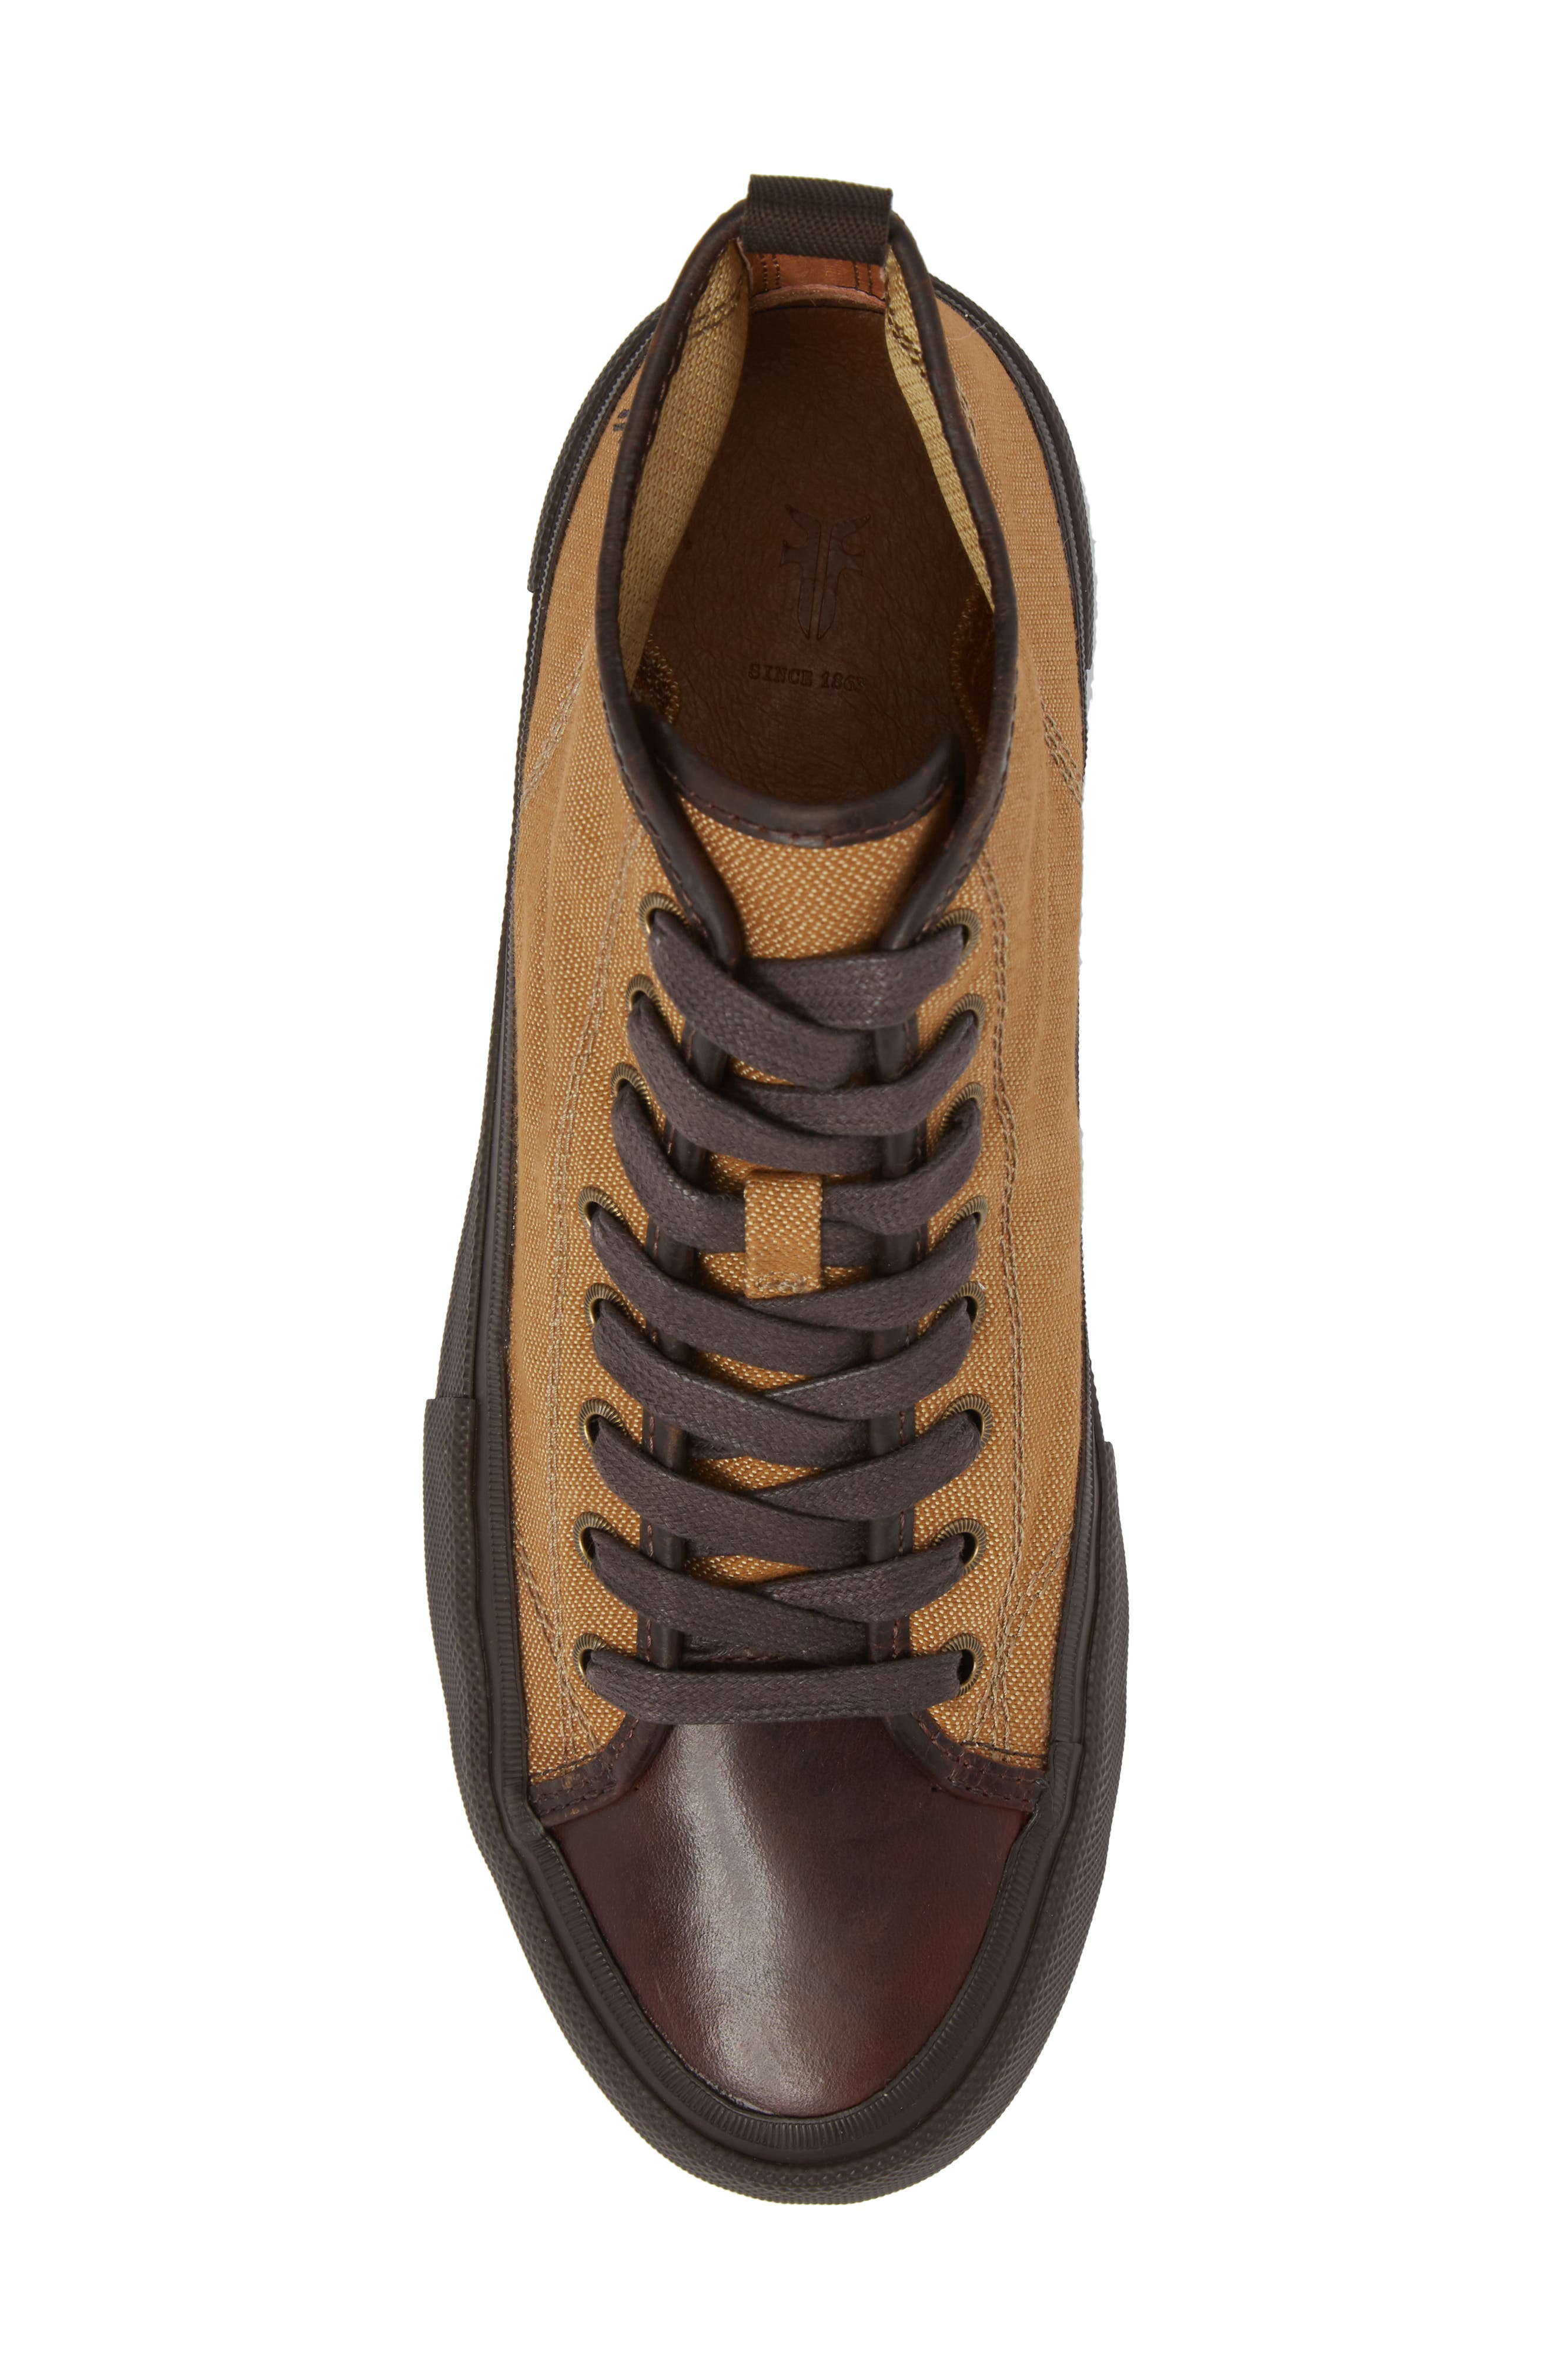 Ryan Lugged Sneaker Boot,                             Alternate thumbnail 5, color,                             Tan Canvas